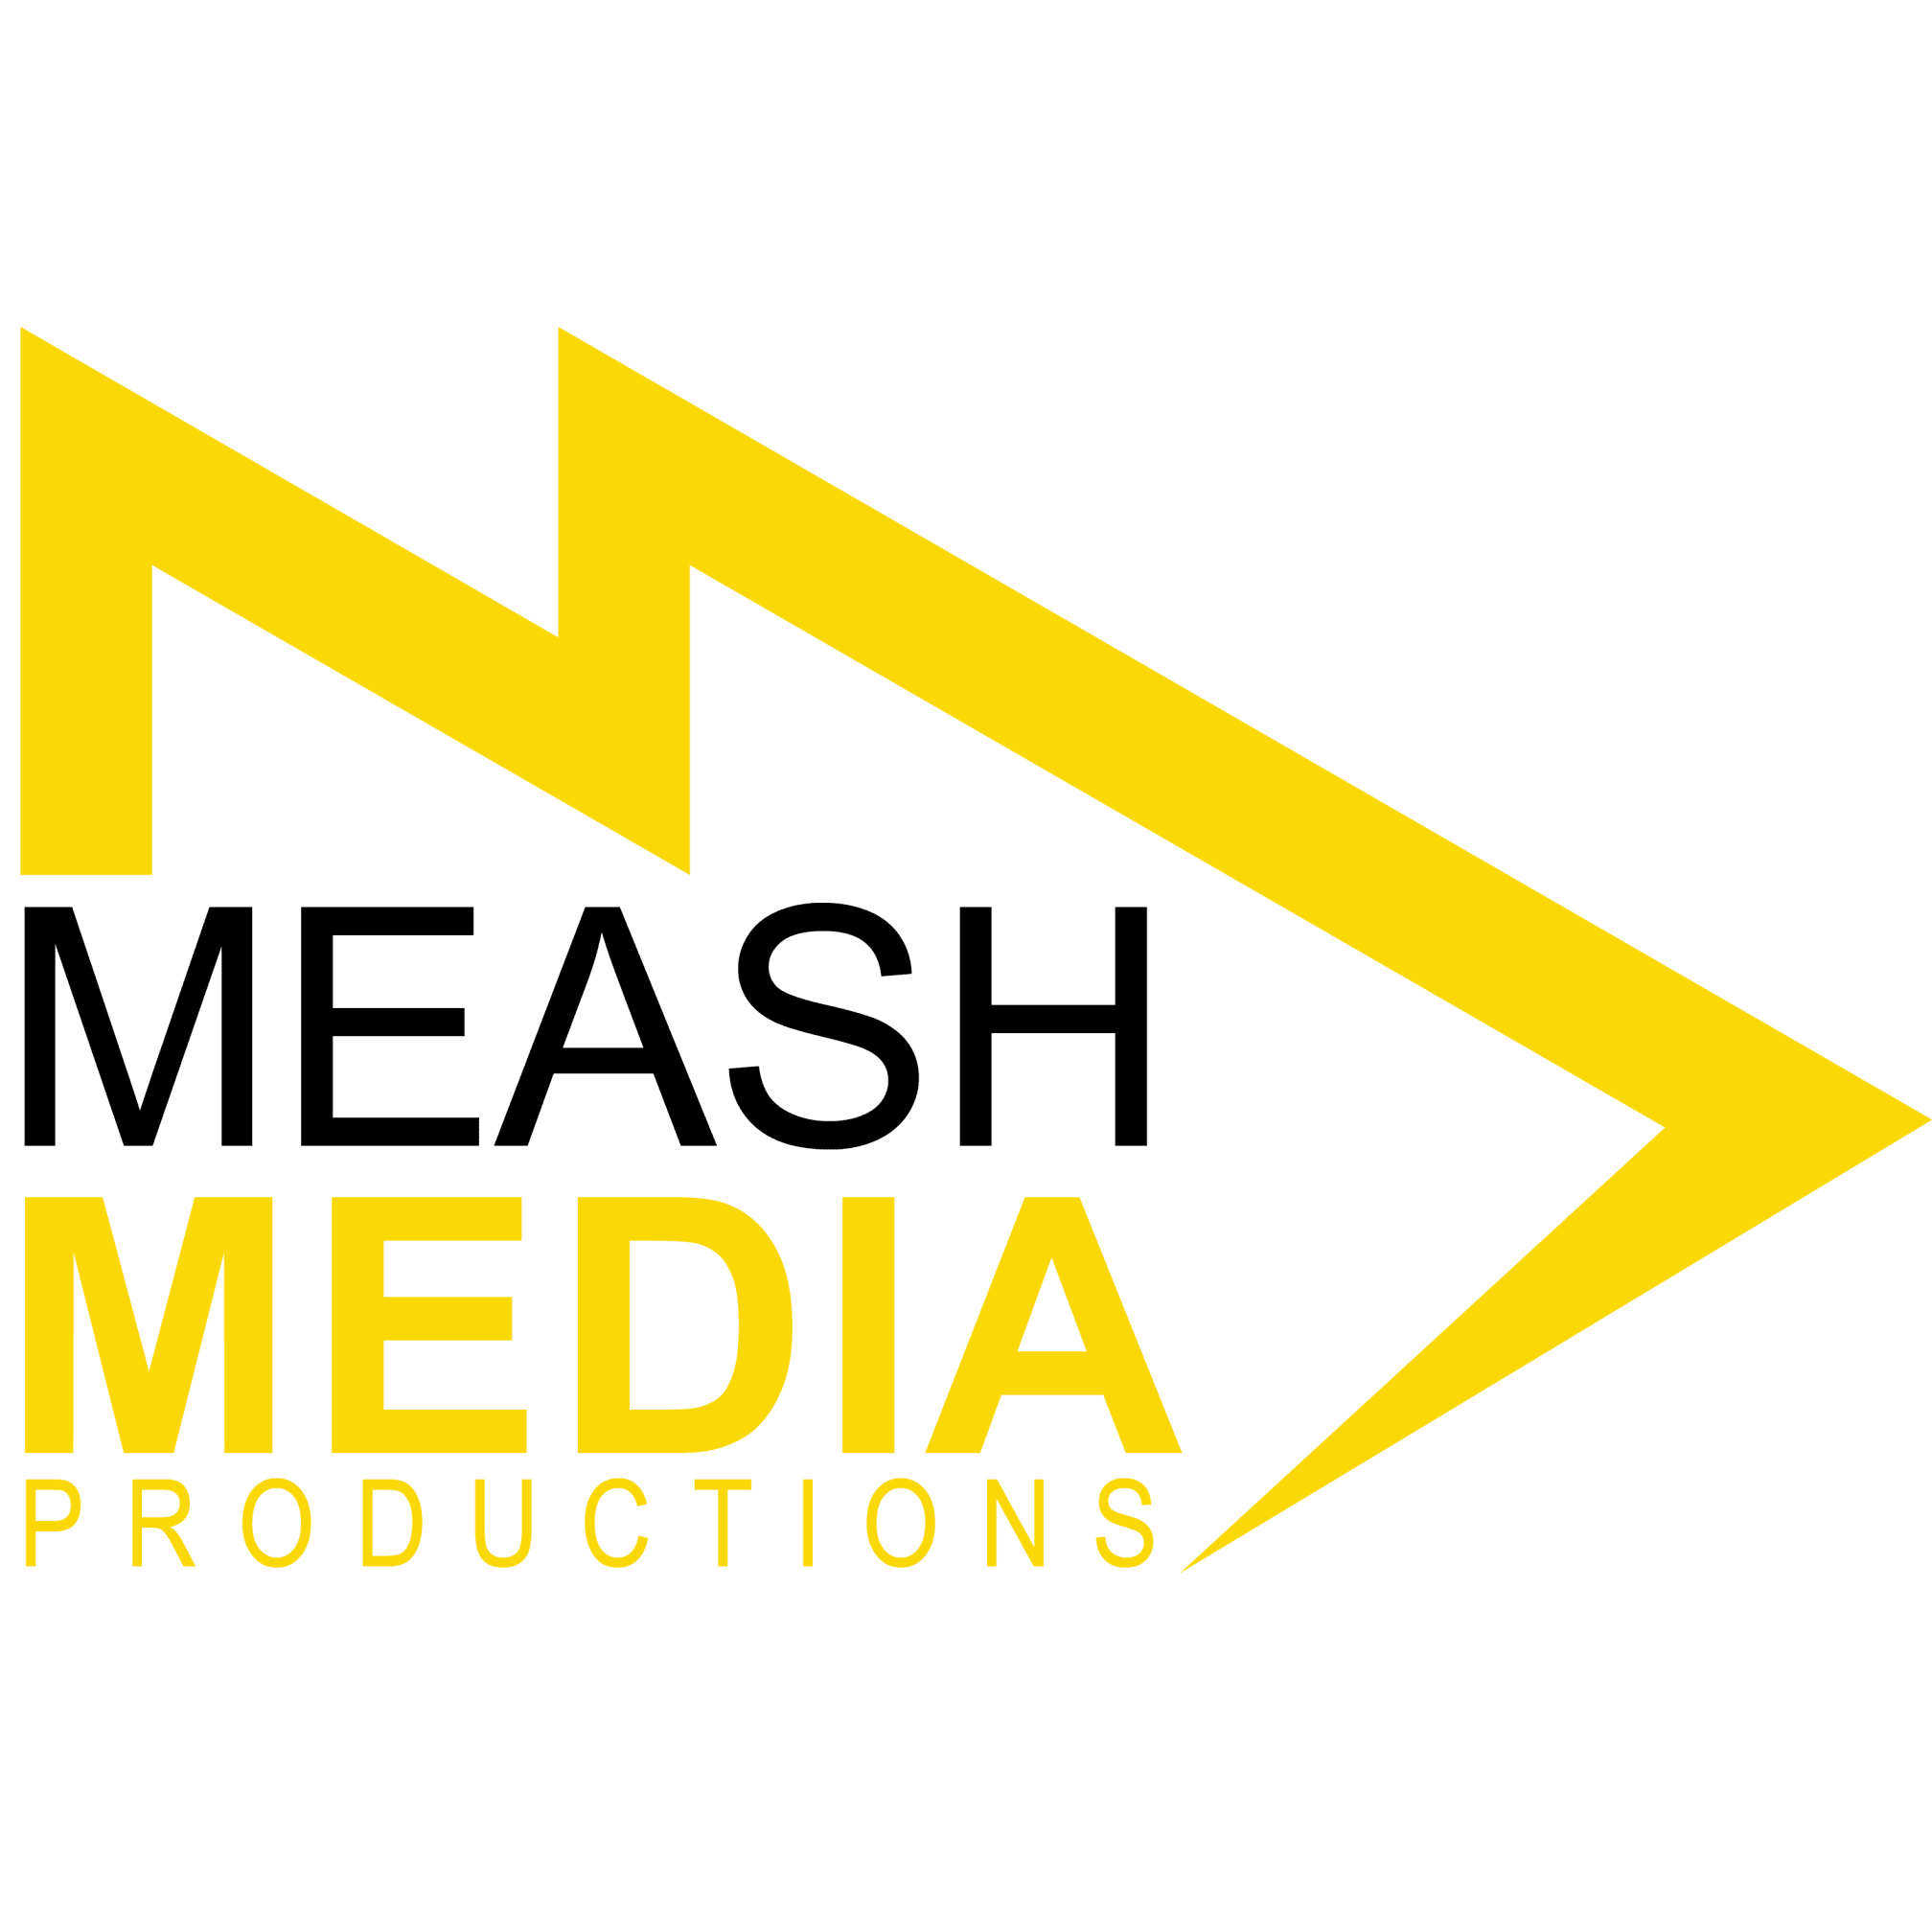 Meash Media Productions - Sunderland, Tyne and Wear SR1 1PB - 07850 199330 | ShowMeLocal.com